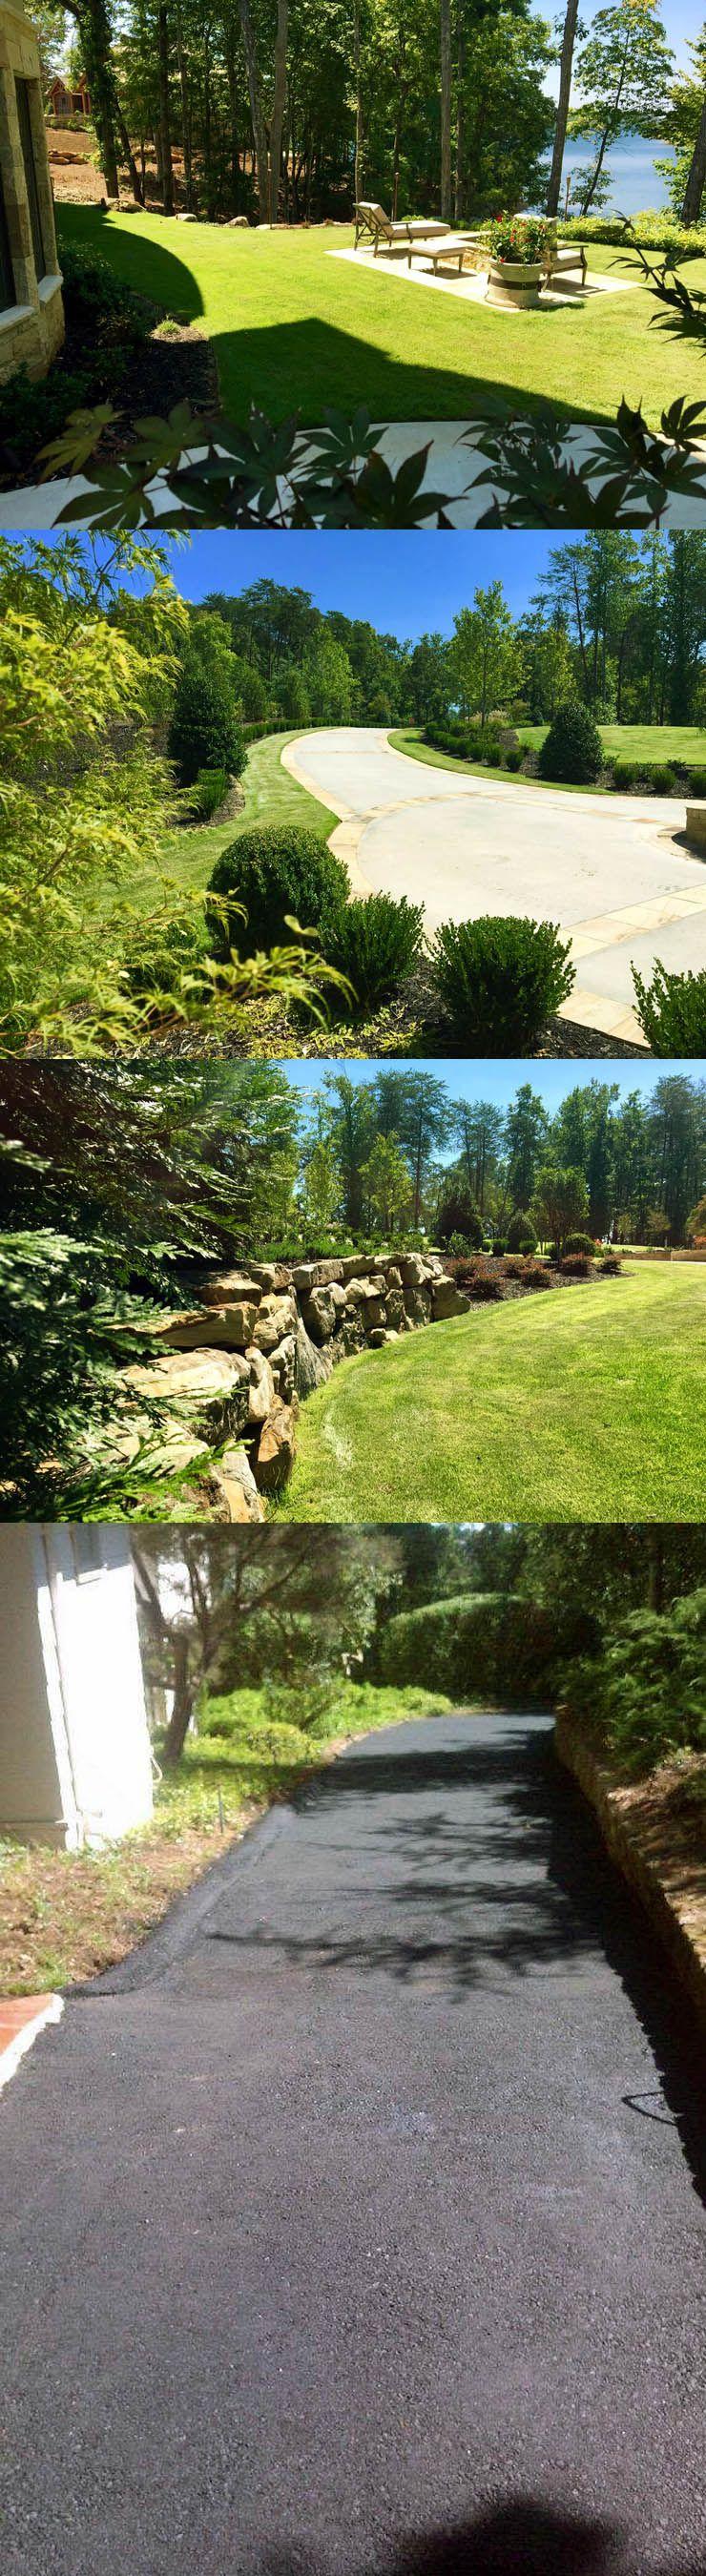 Trendy backyard desert landscaping ideas on a budget one ... on Backyard Desert Landscaping Ideas On A Budget id=76631